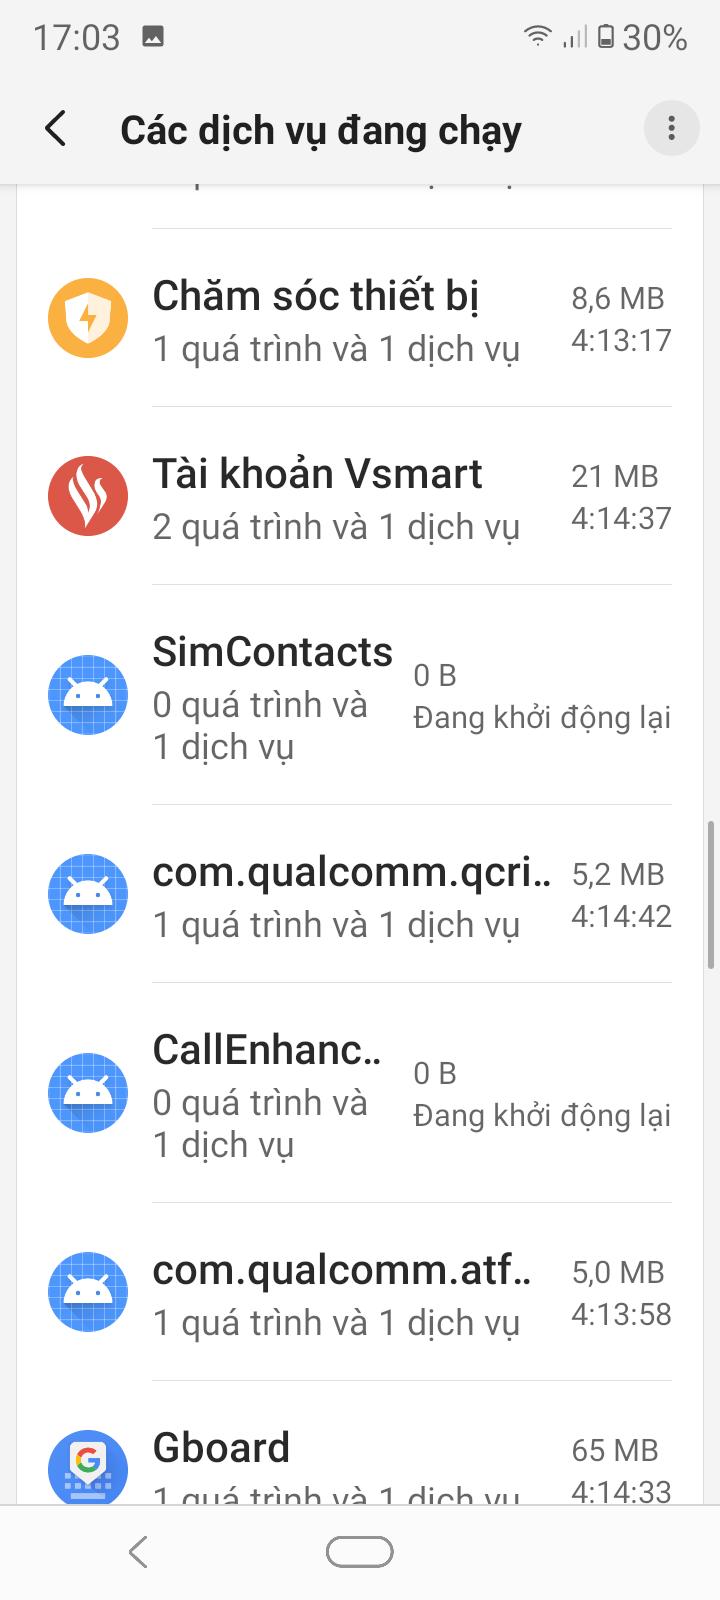 Screenshot_20200726_170316.png